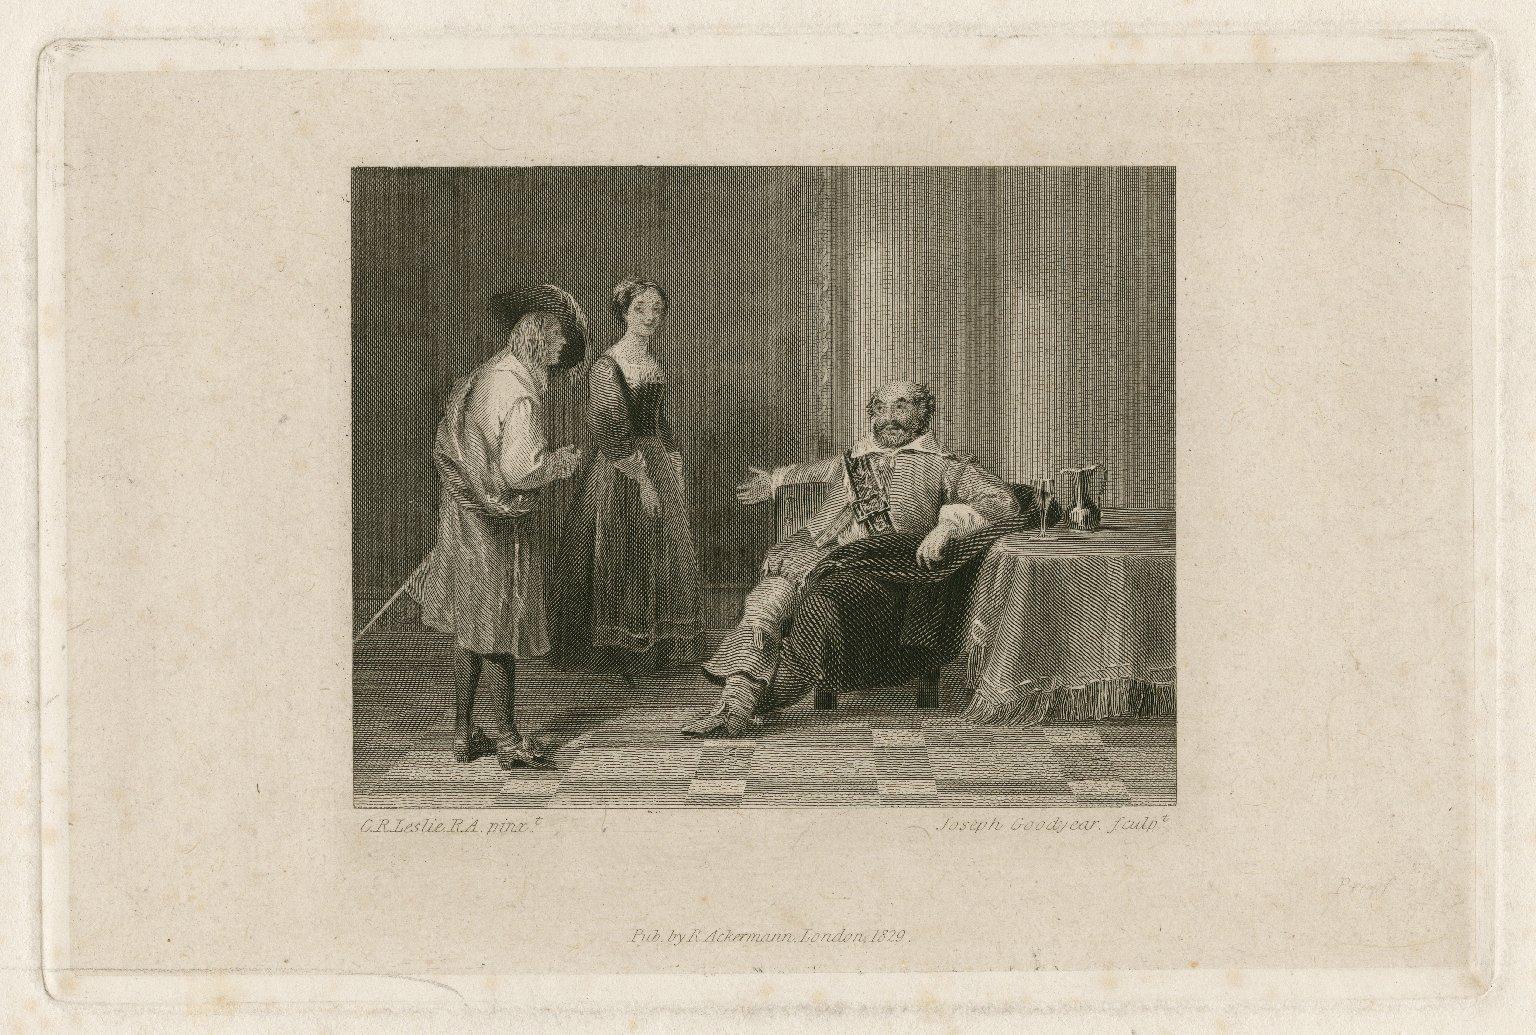 Twelfth night, act I, sc. 3 [graphic] / C. R. Leslie, R.A. pinxt. ; Joseph Goodyear sculpt.